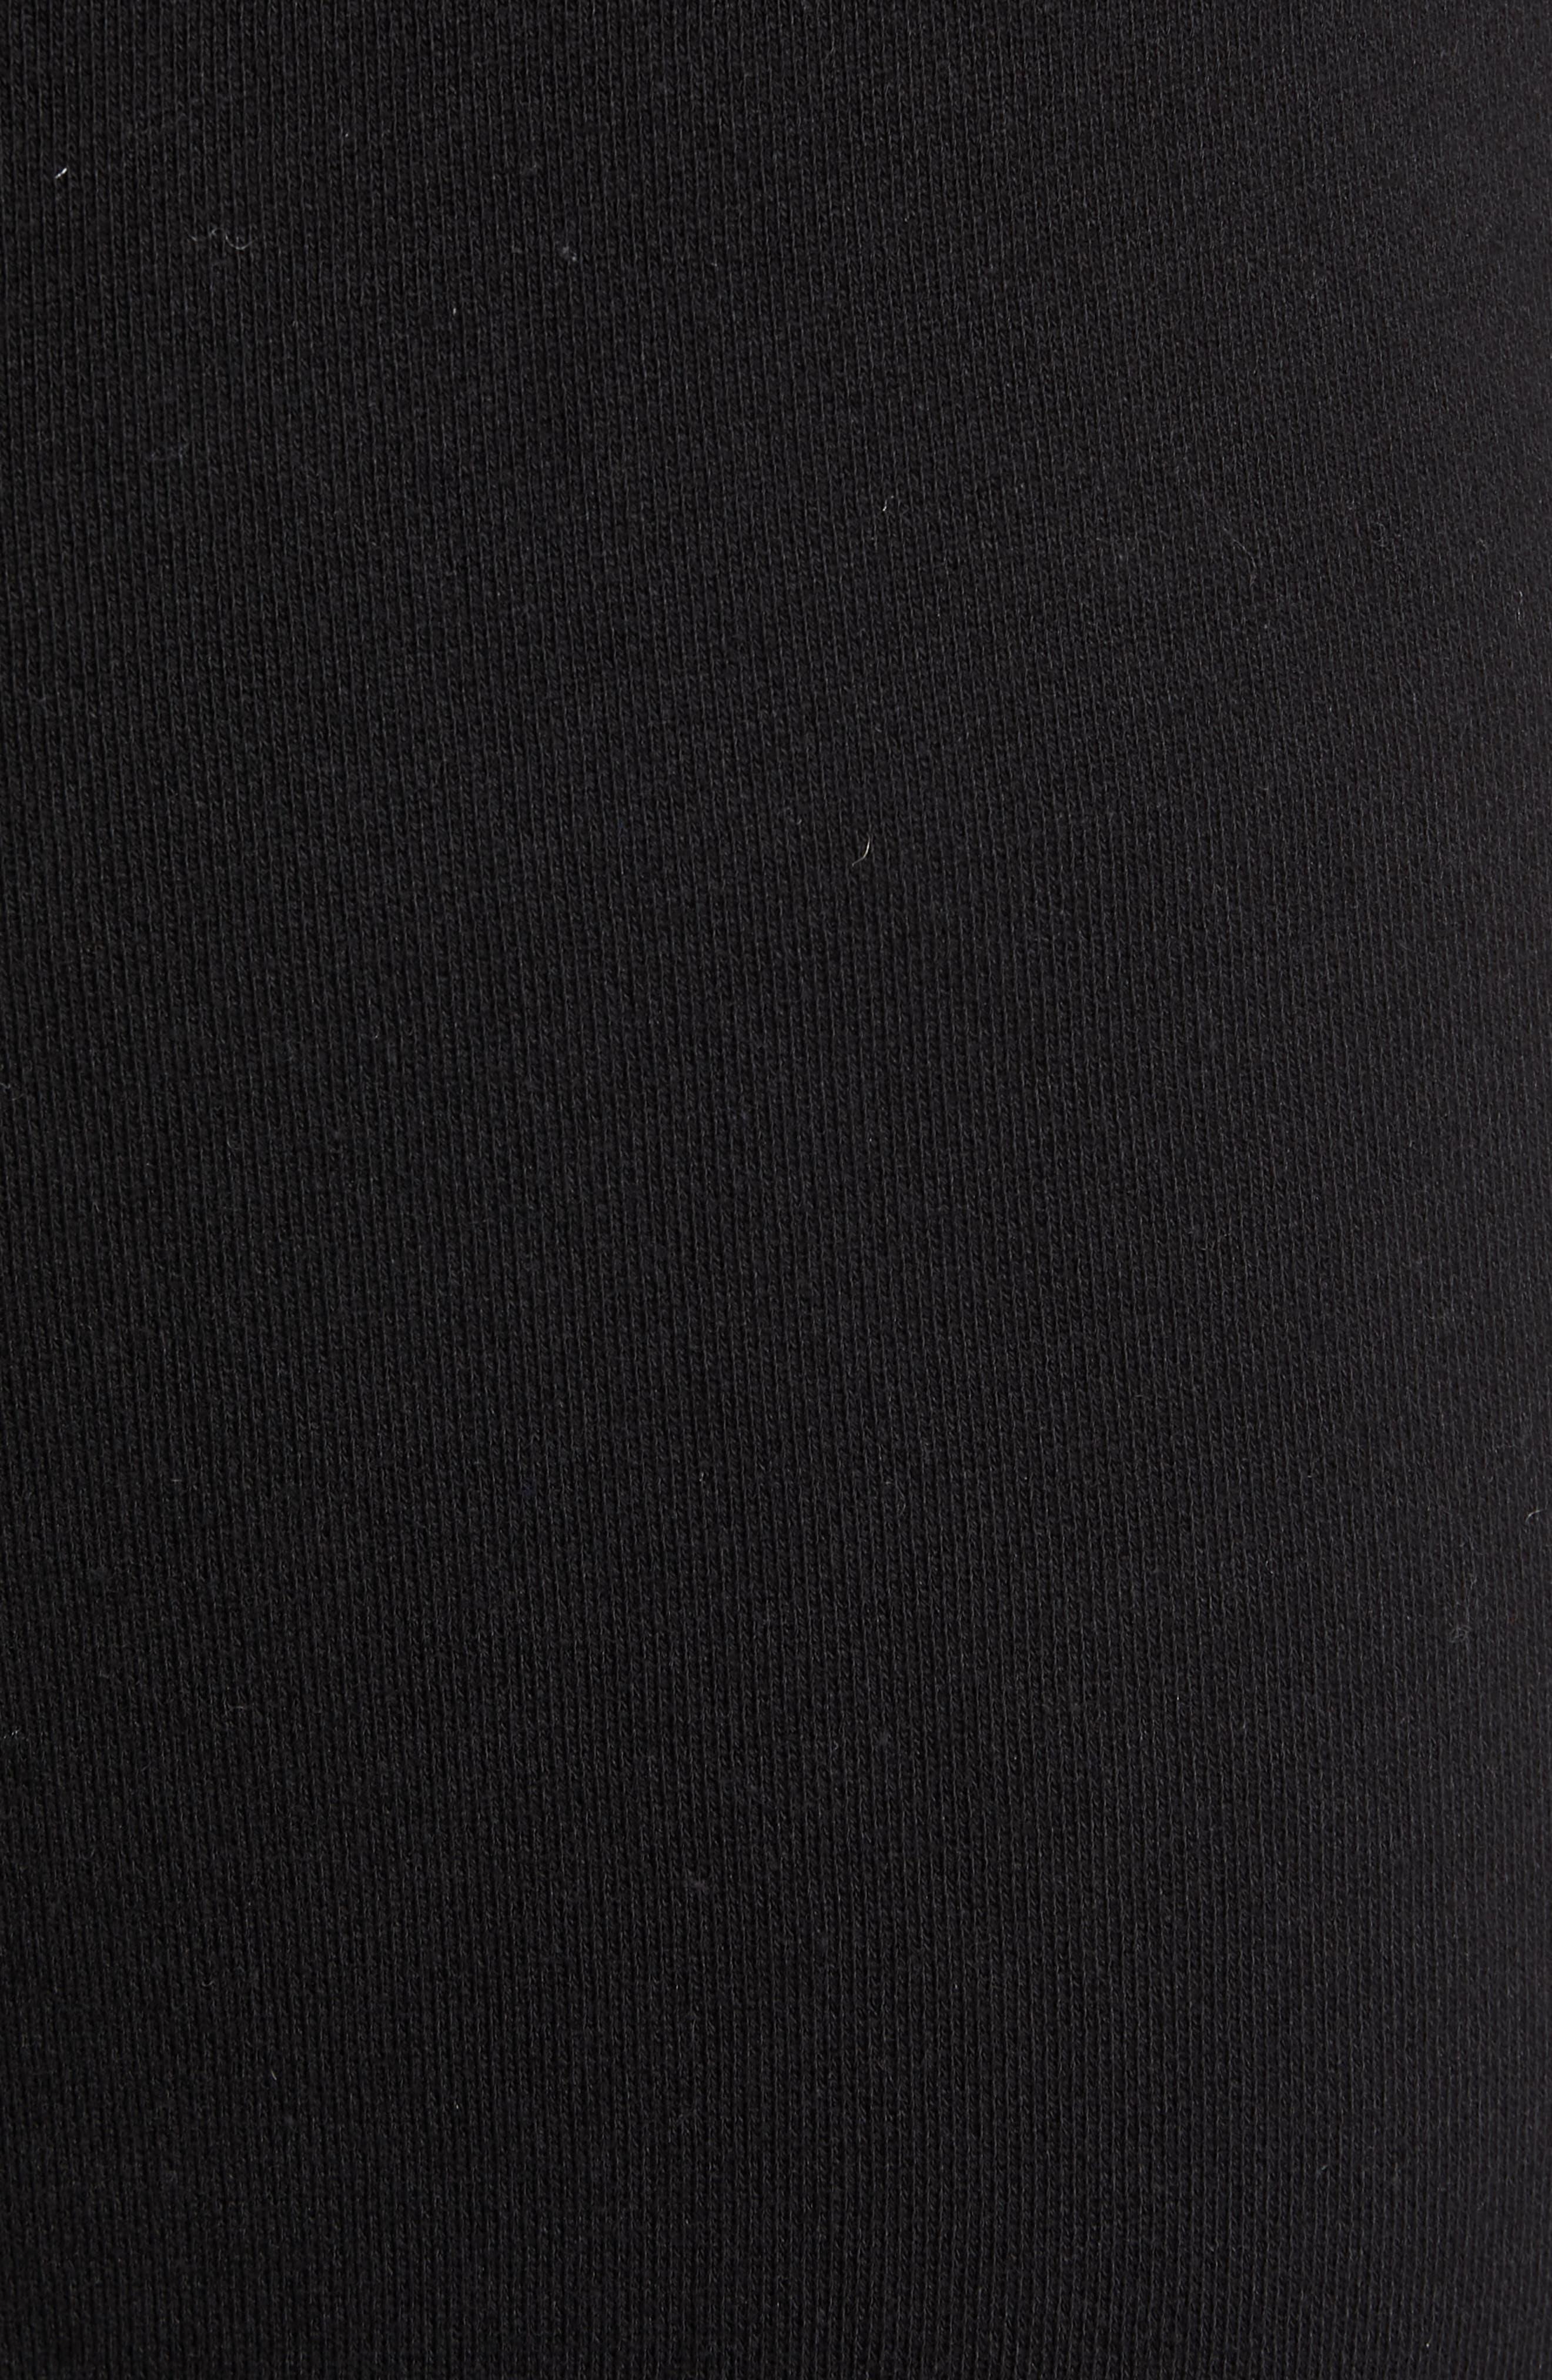 CLUB MONACO,                             Articulated Seam Jogger Pants,                             Alternate thumbnail 5, color,                             001